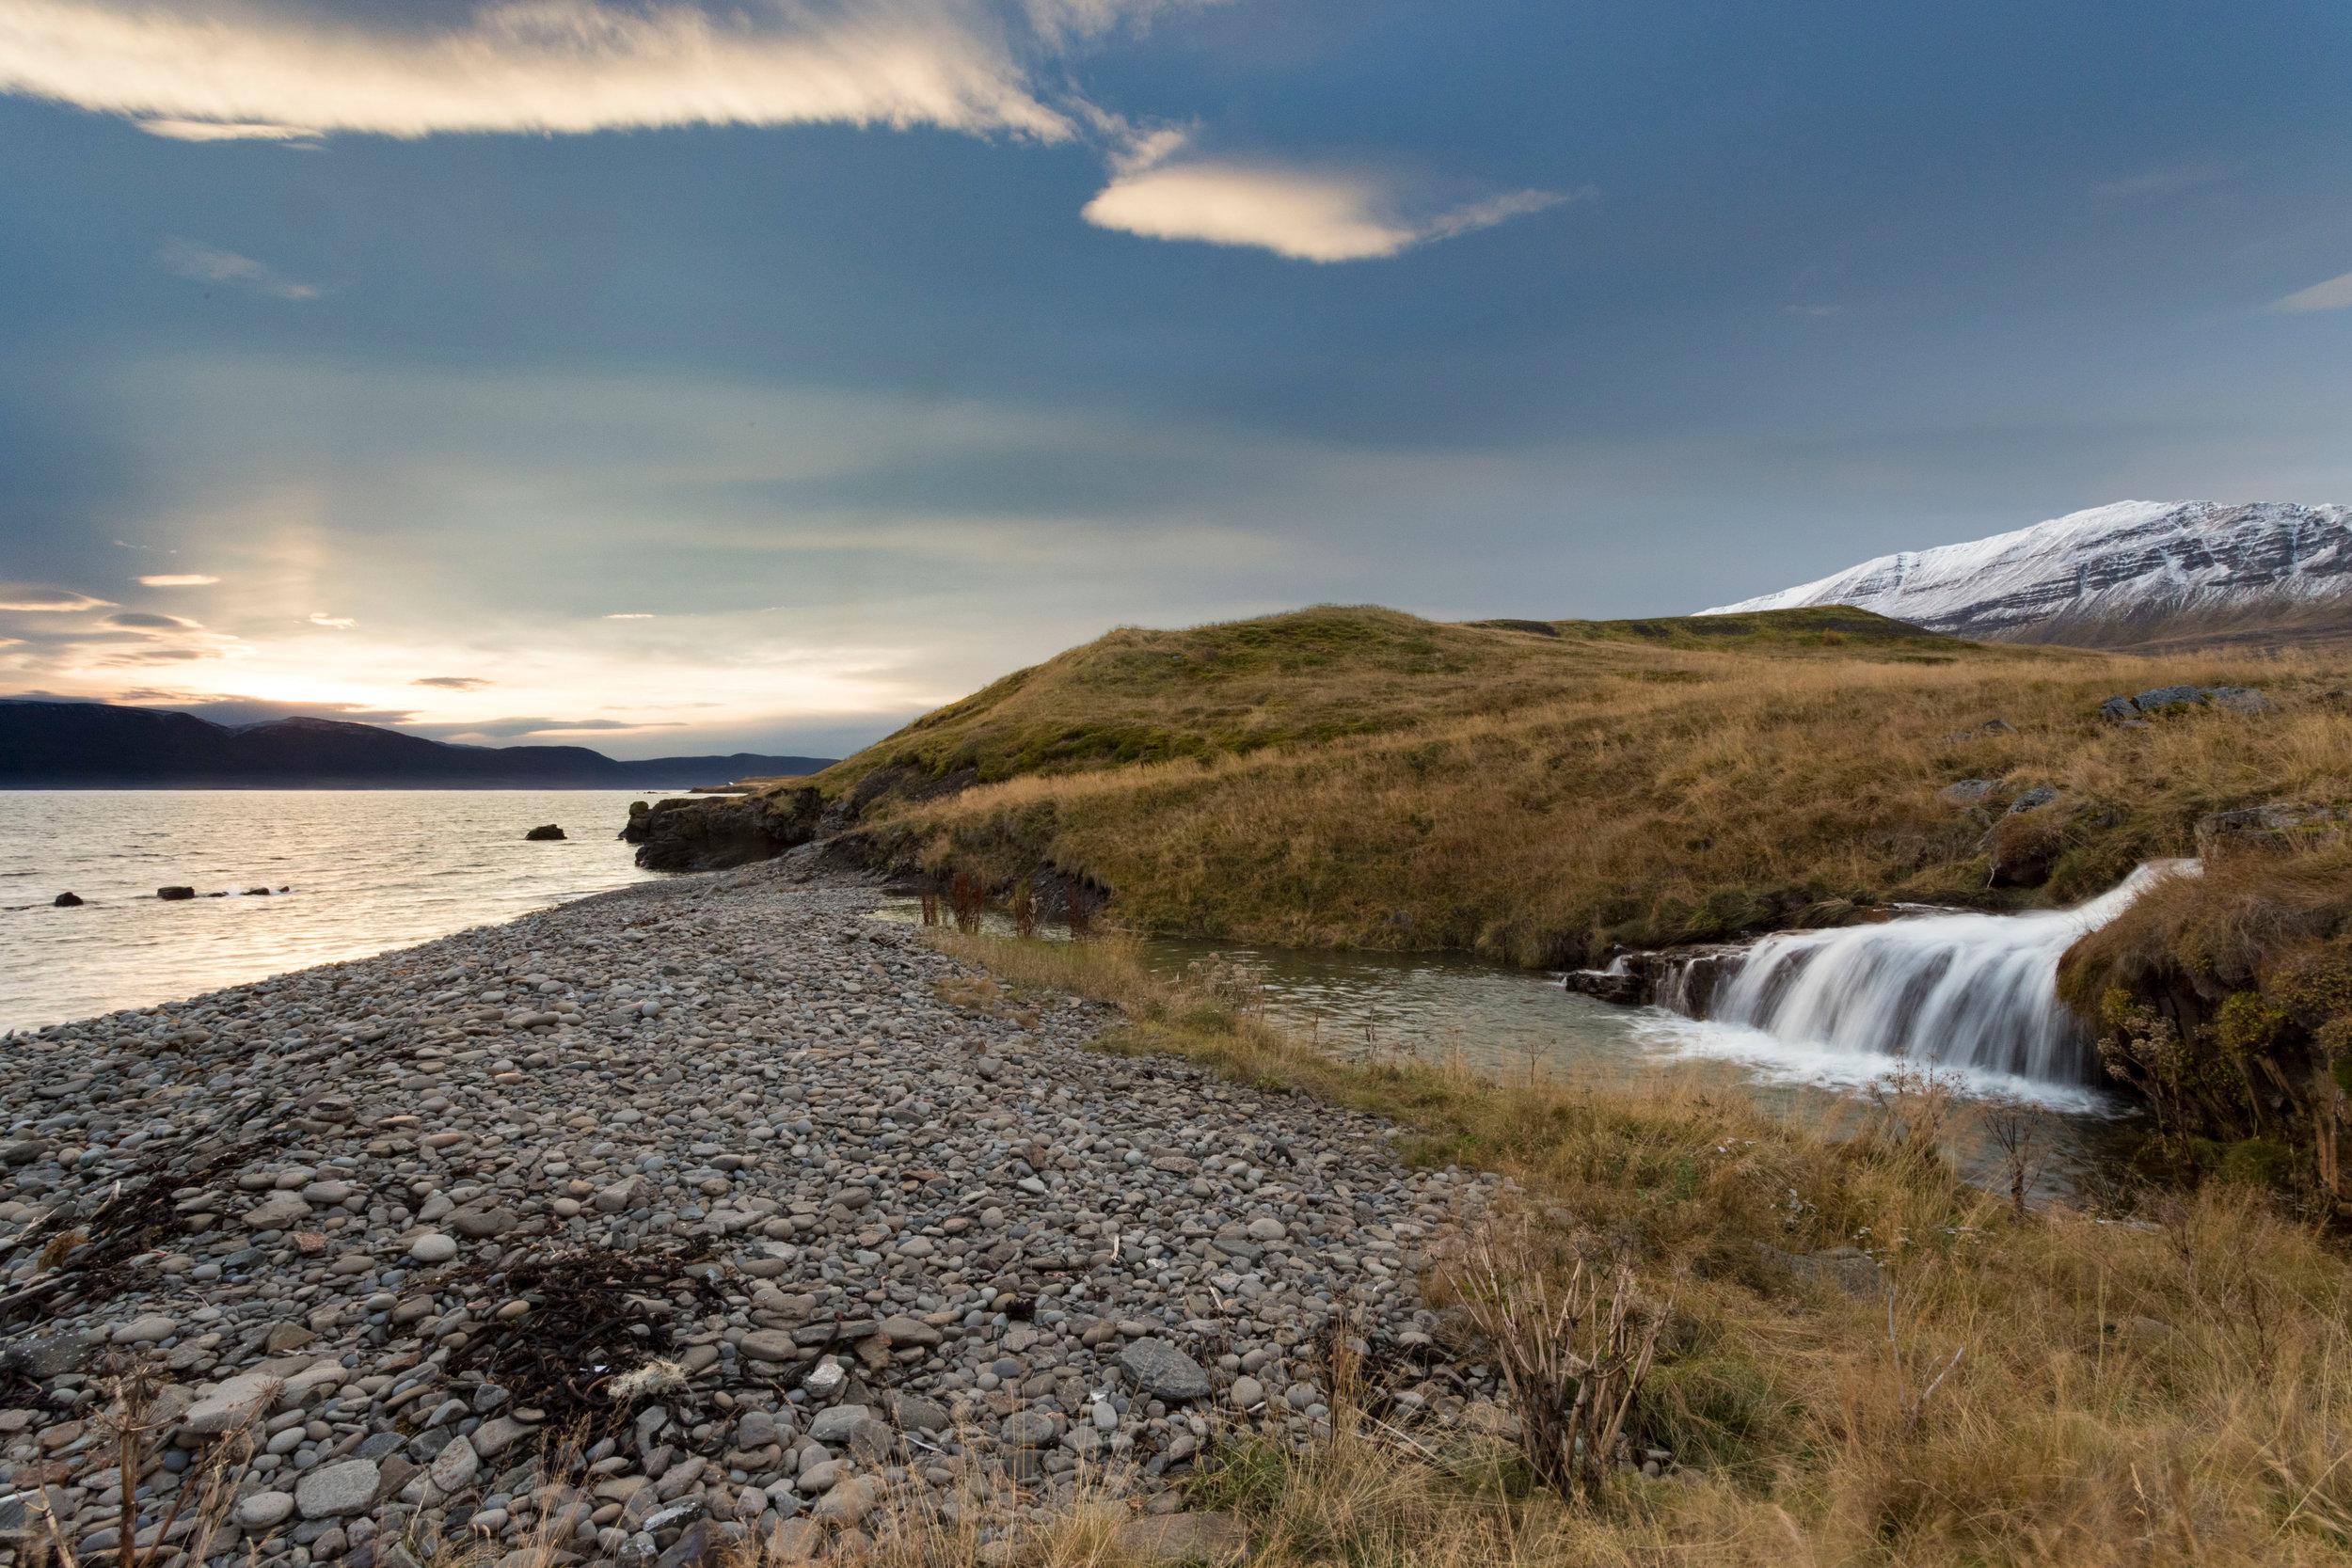 october 18, 2017  eyjafjörður - hauganes, iceland